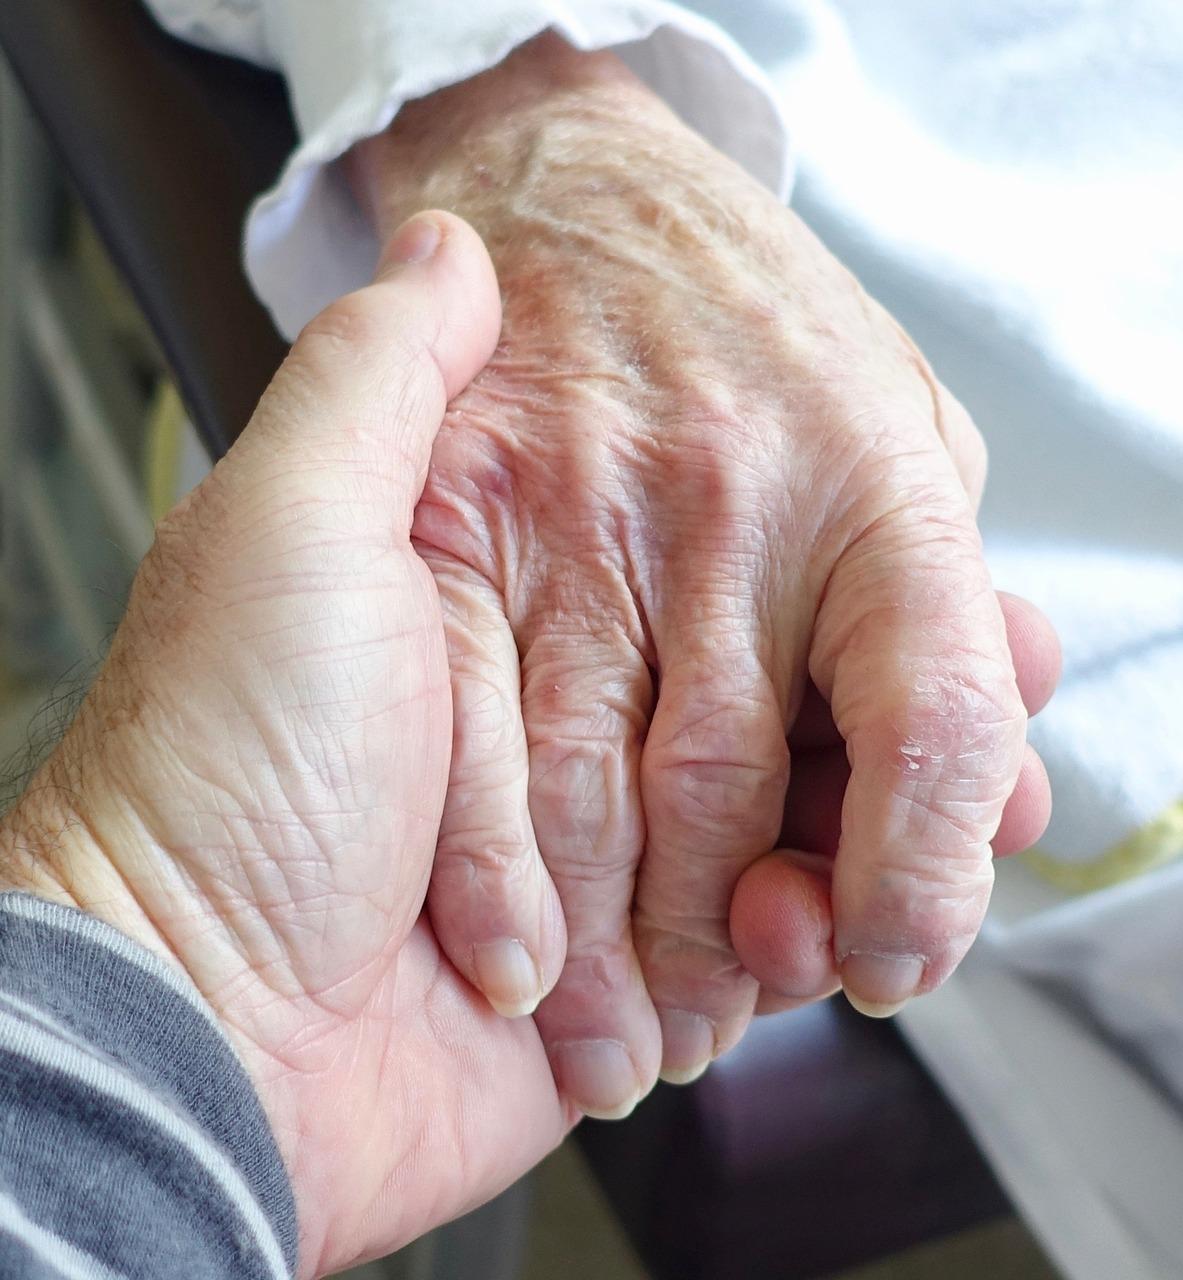 Sympathy Hand Elderly Care Woman Aged Senior